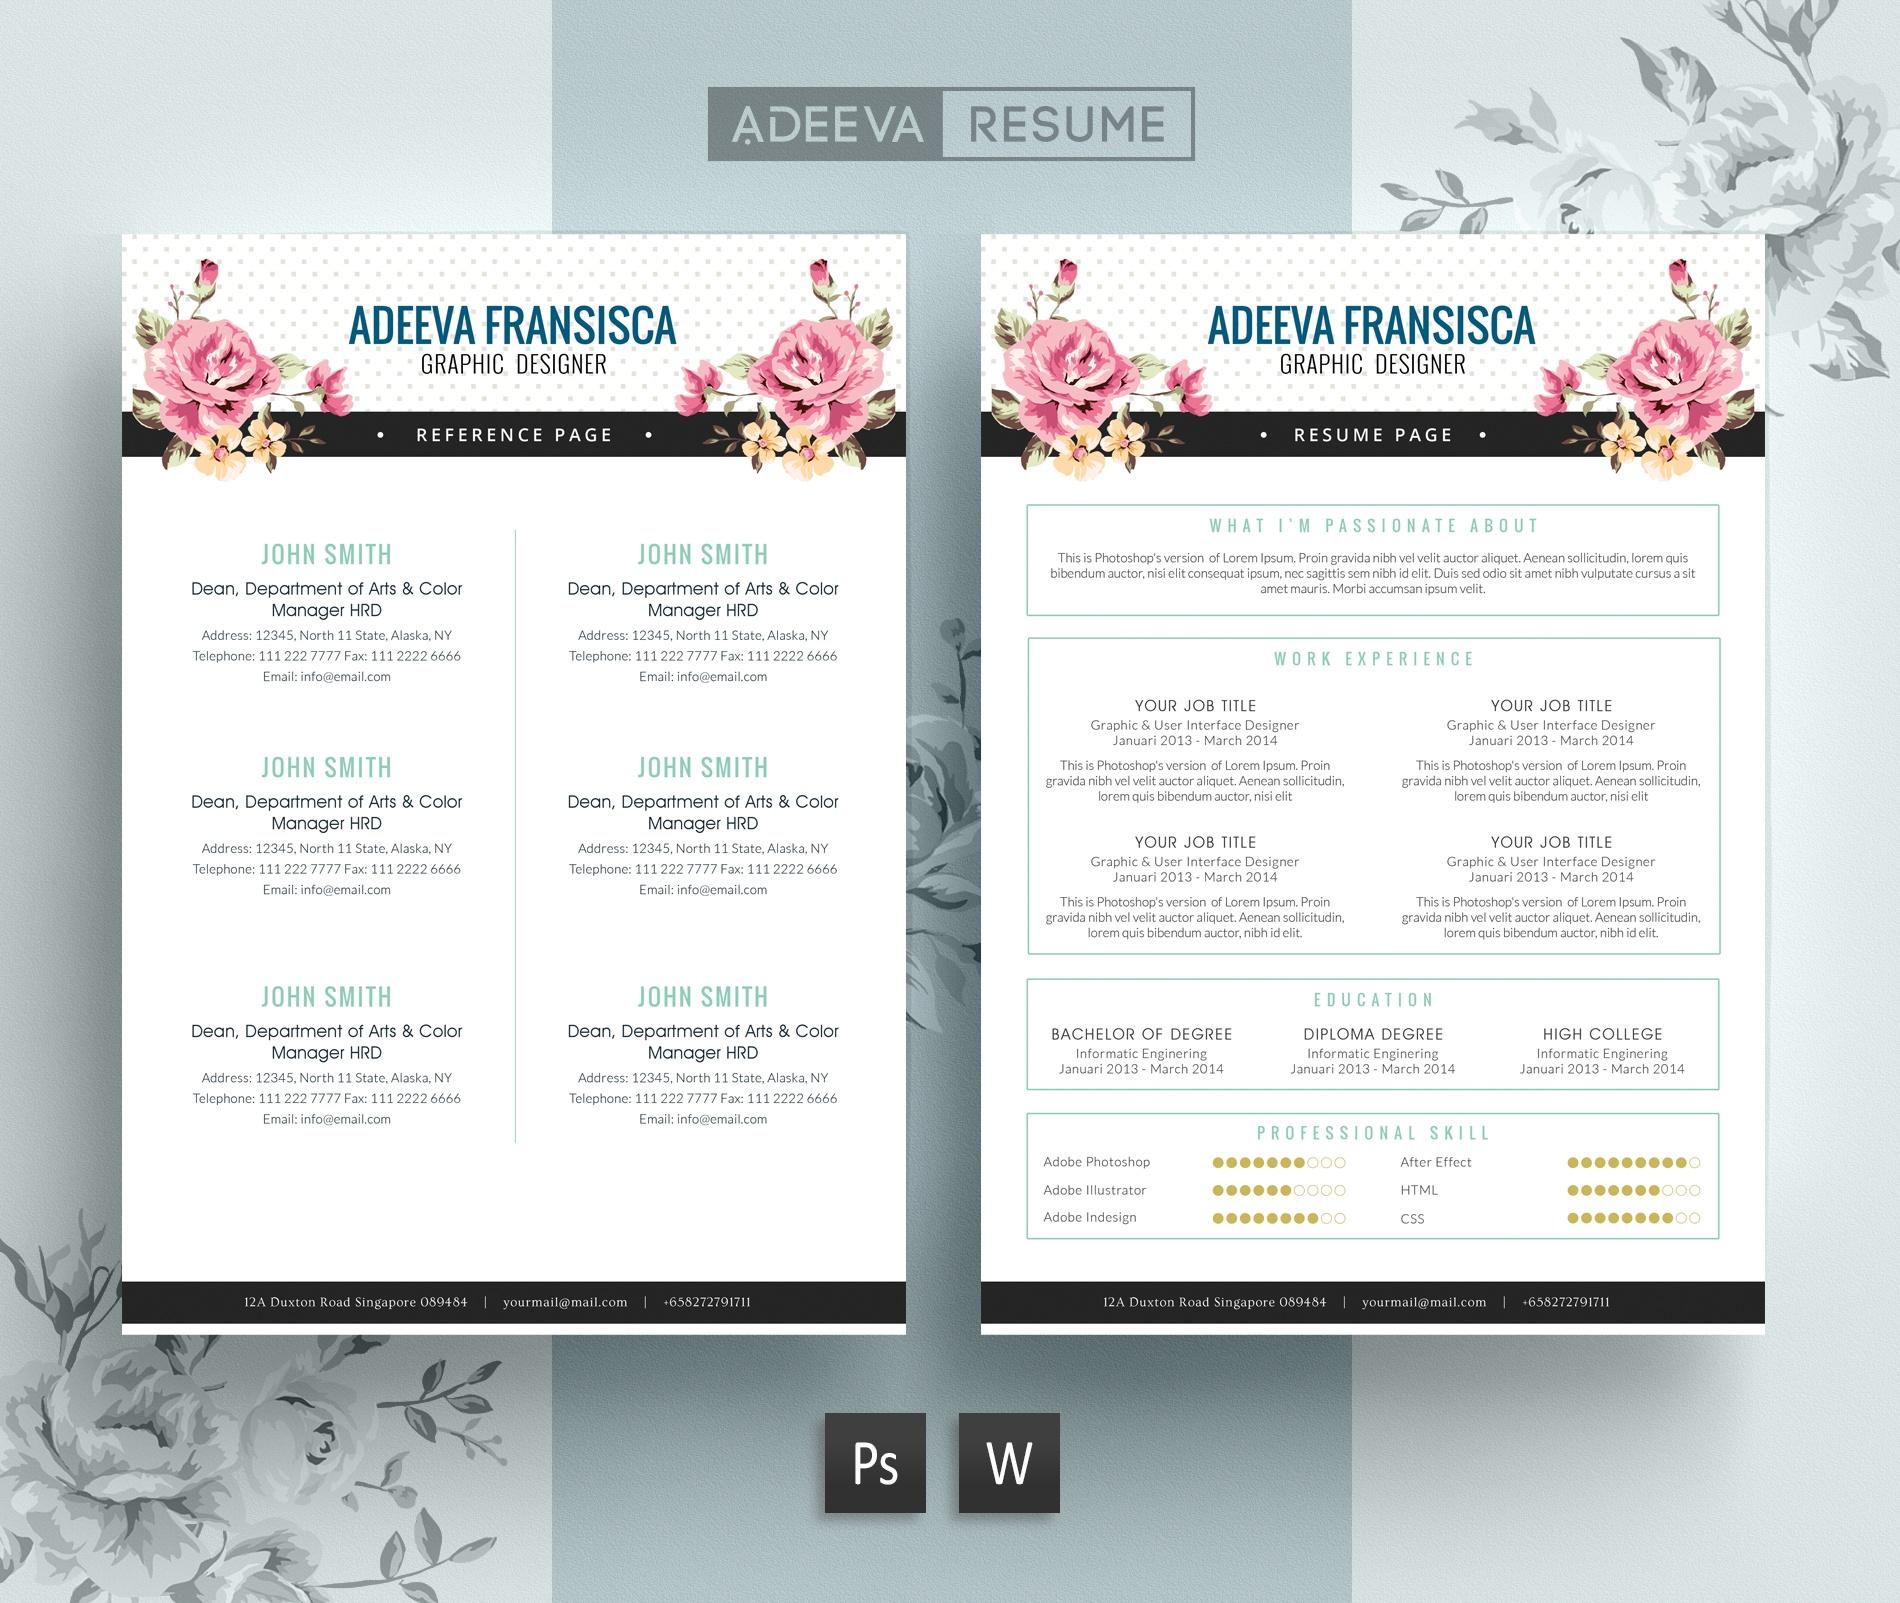 Free Vintage Resume Template / CV Template | Adeeva Fr ...